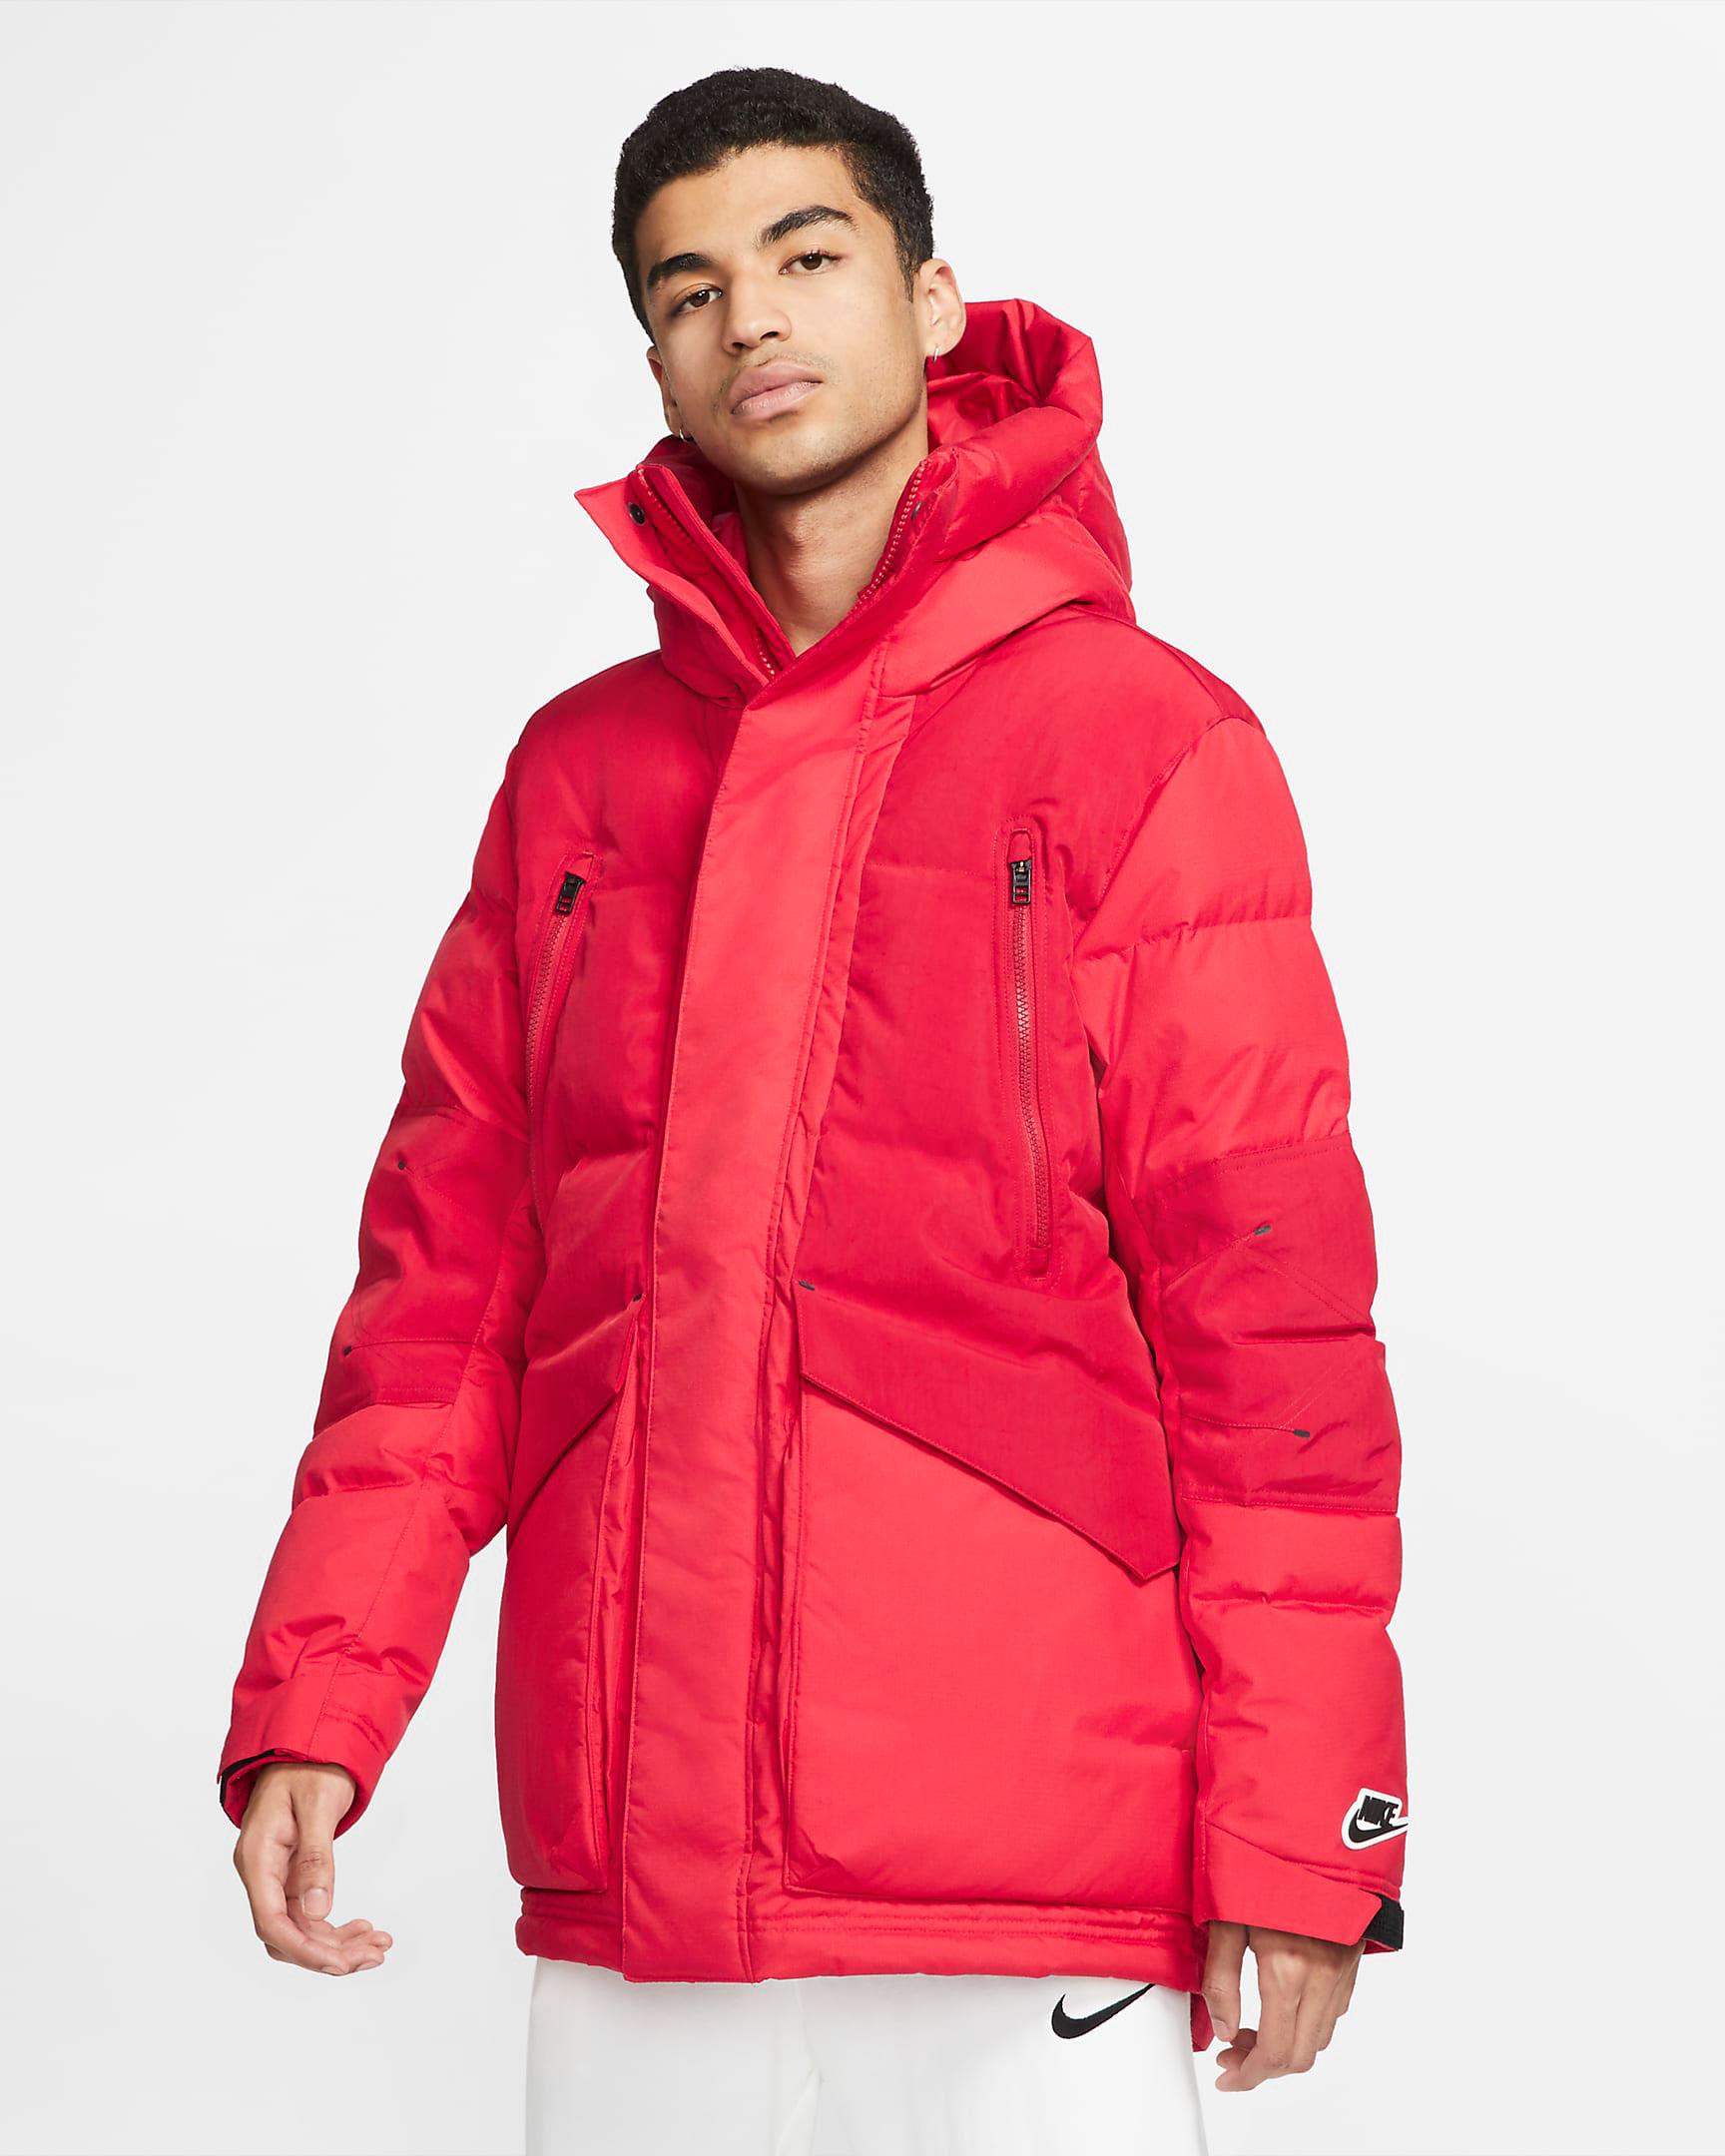 nike-air-max-90-nordic-christmas-winter-jacket-1